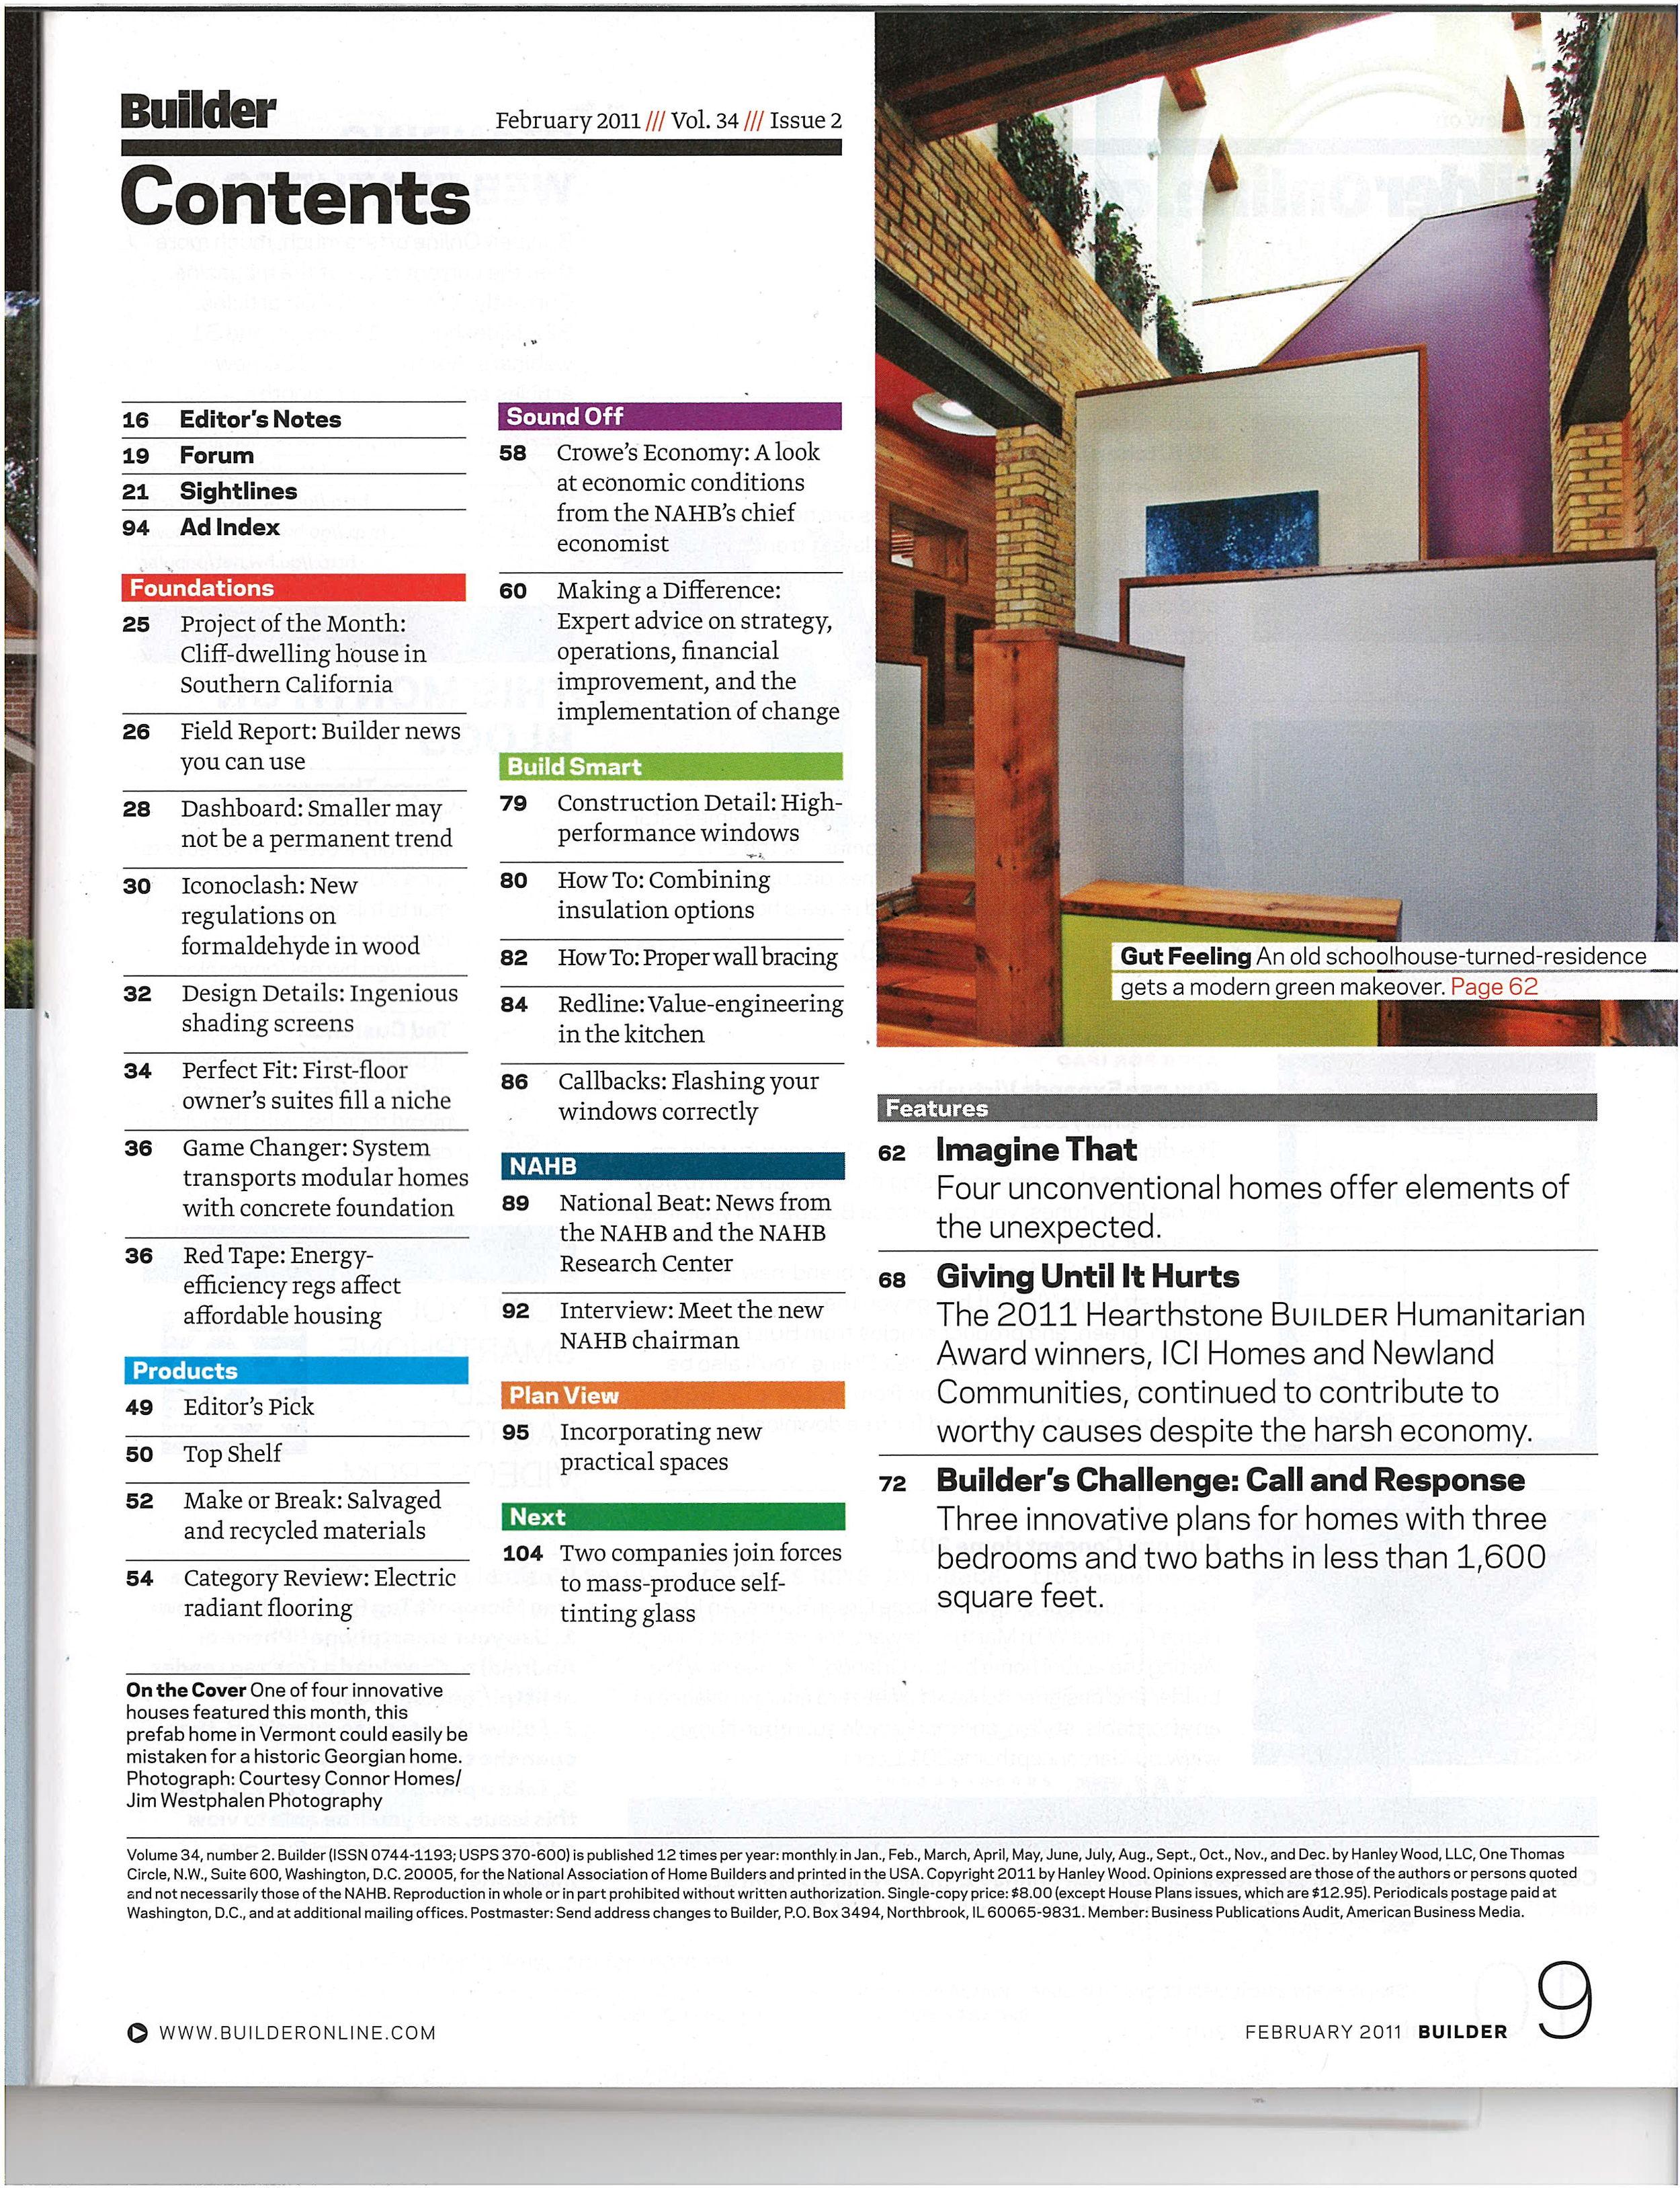 02-2011_BuilderMagazine_ImagineThat_Page_2.jpg